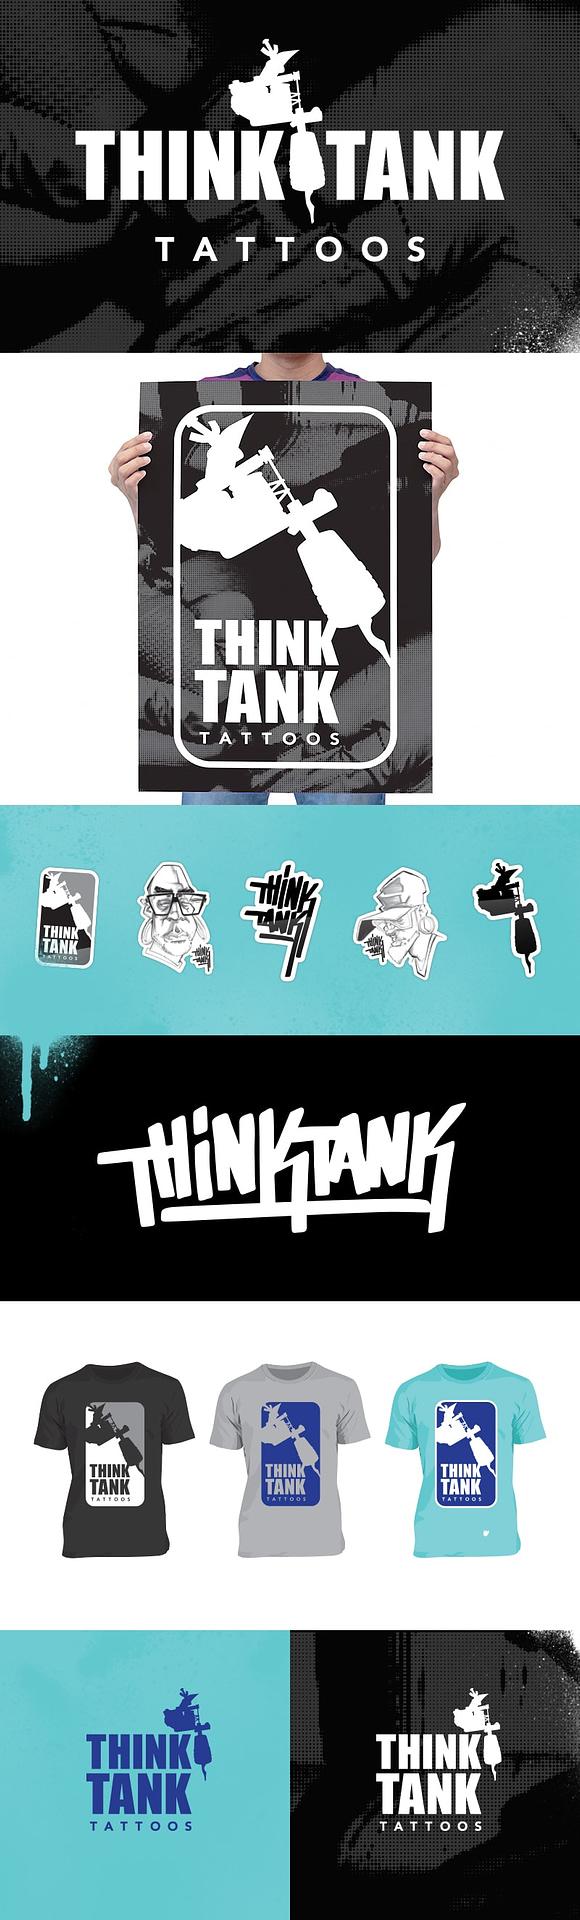 Think Tank Tattoos